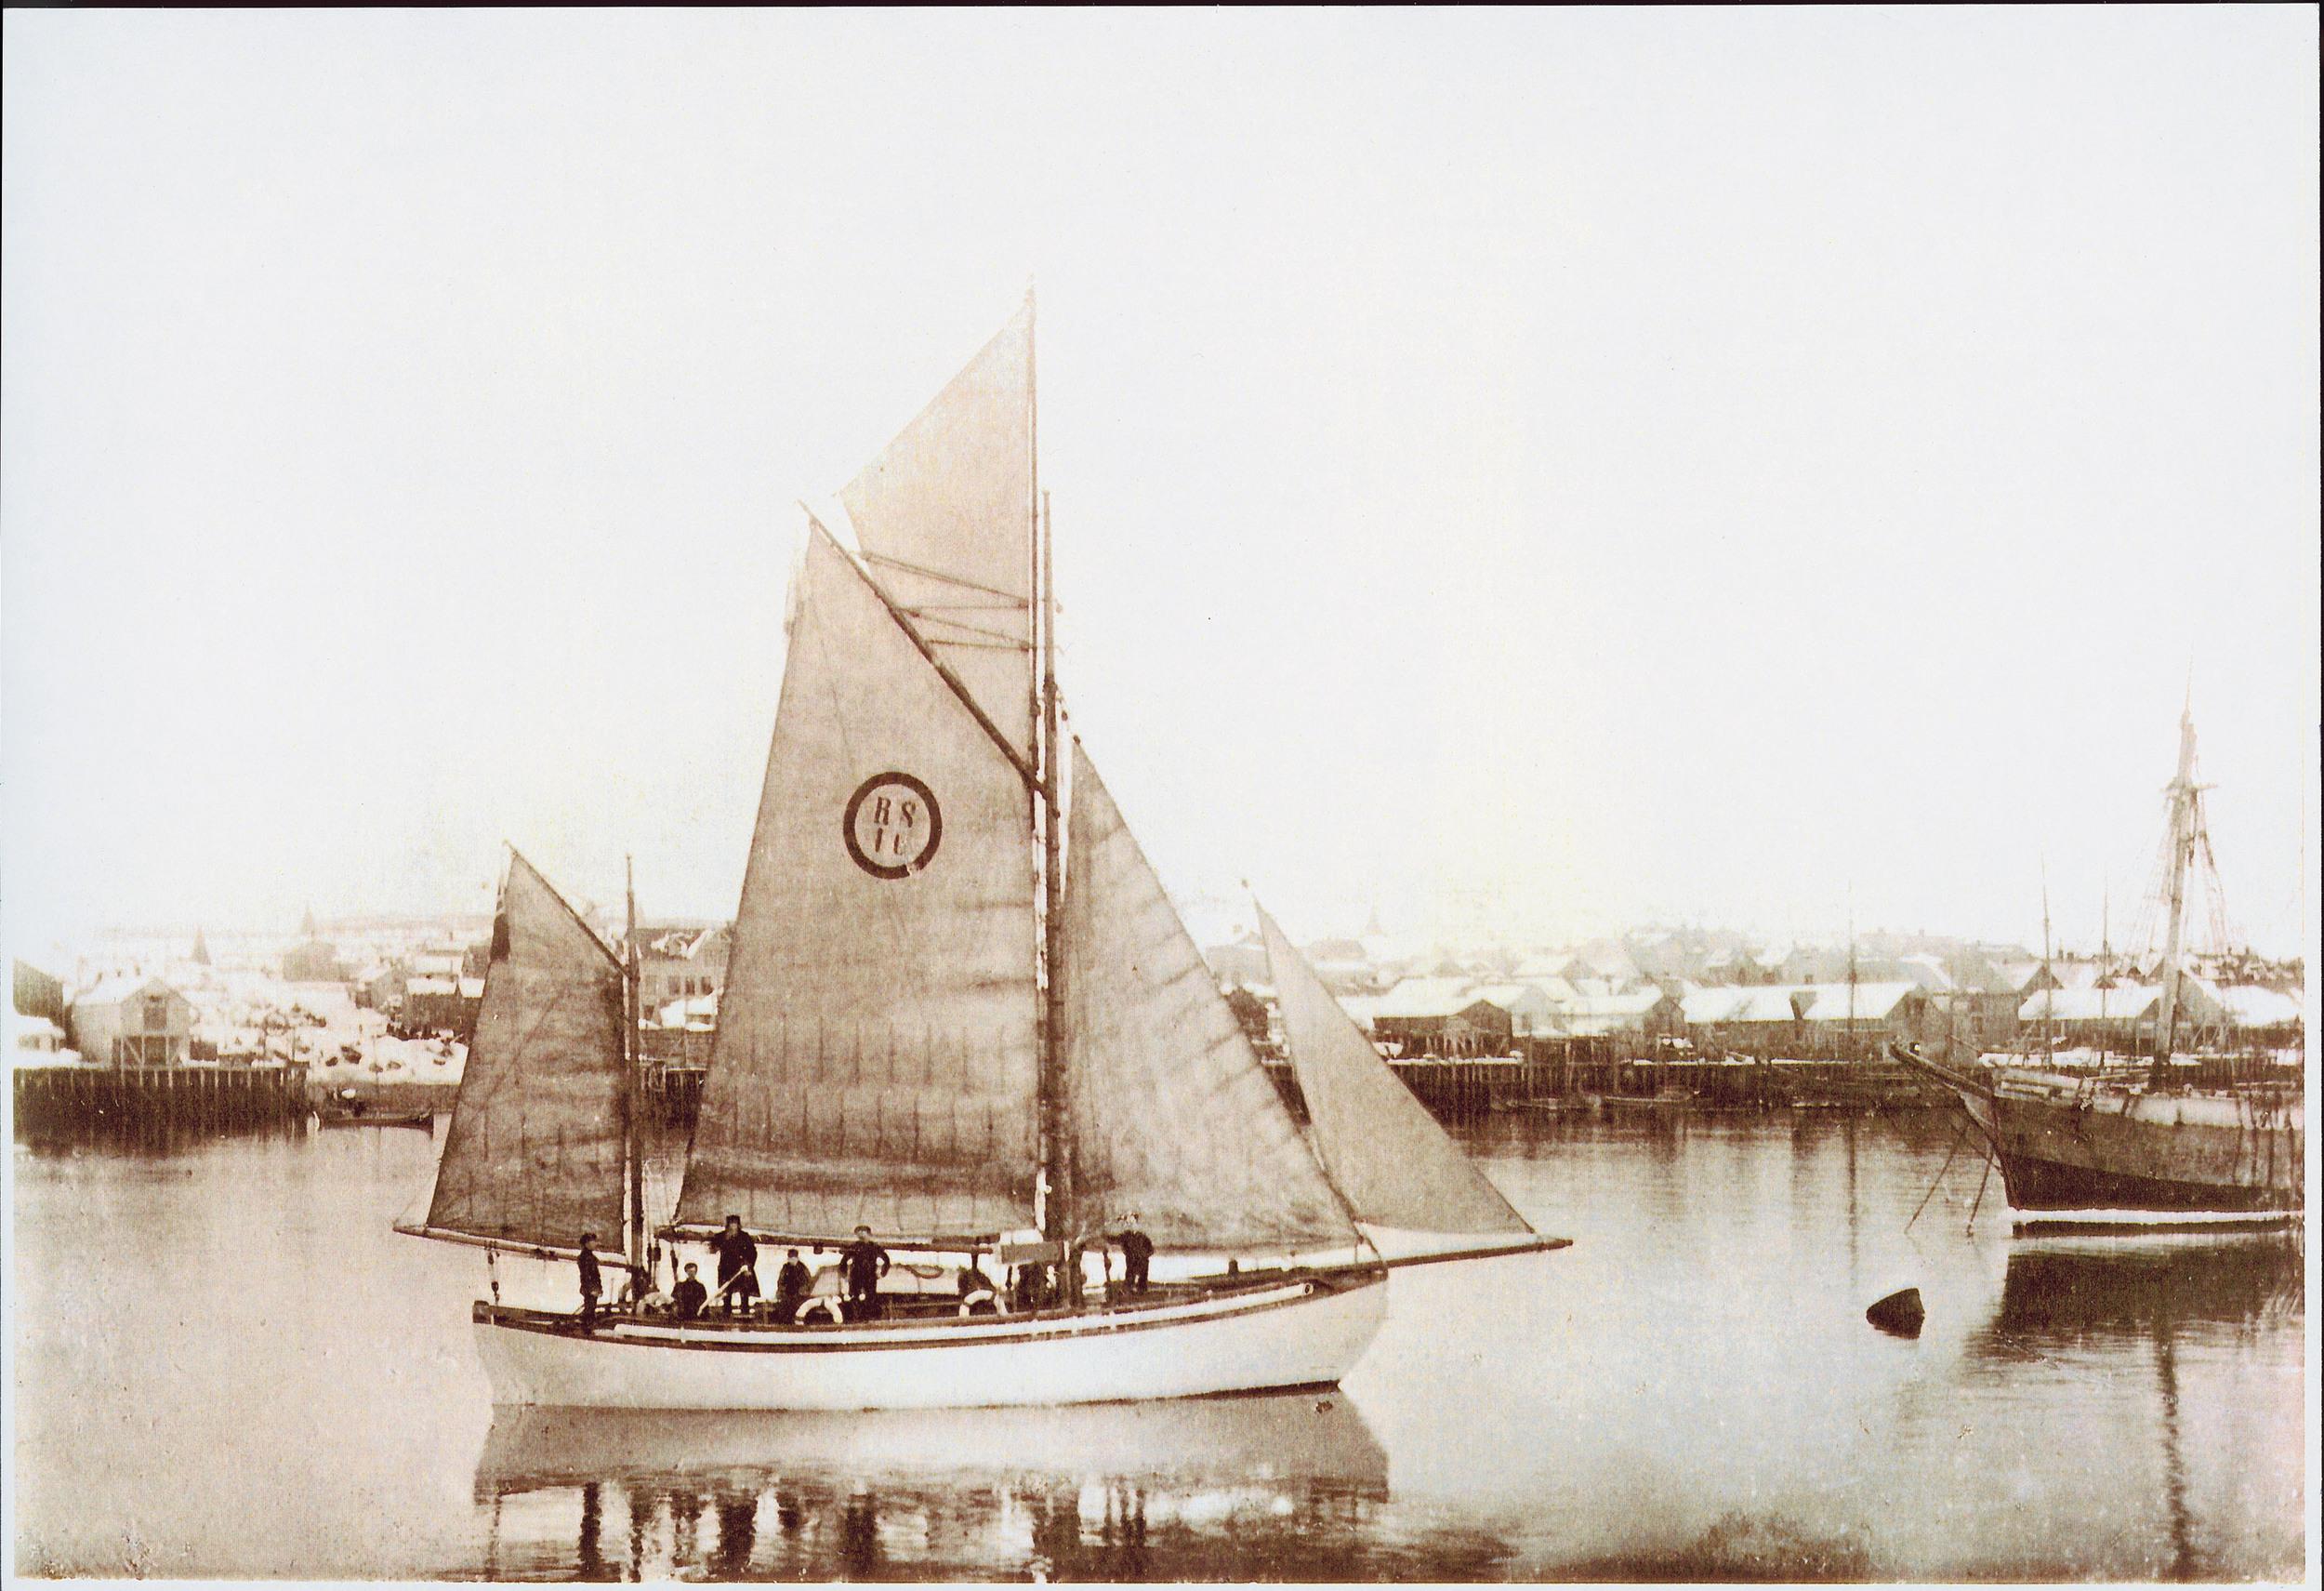 RS-10 Christiania, 1895